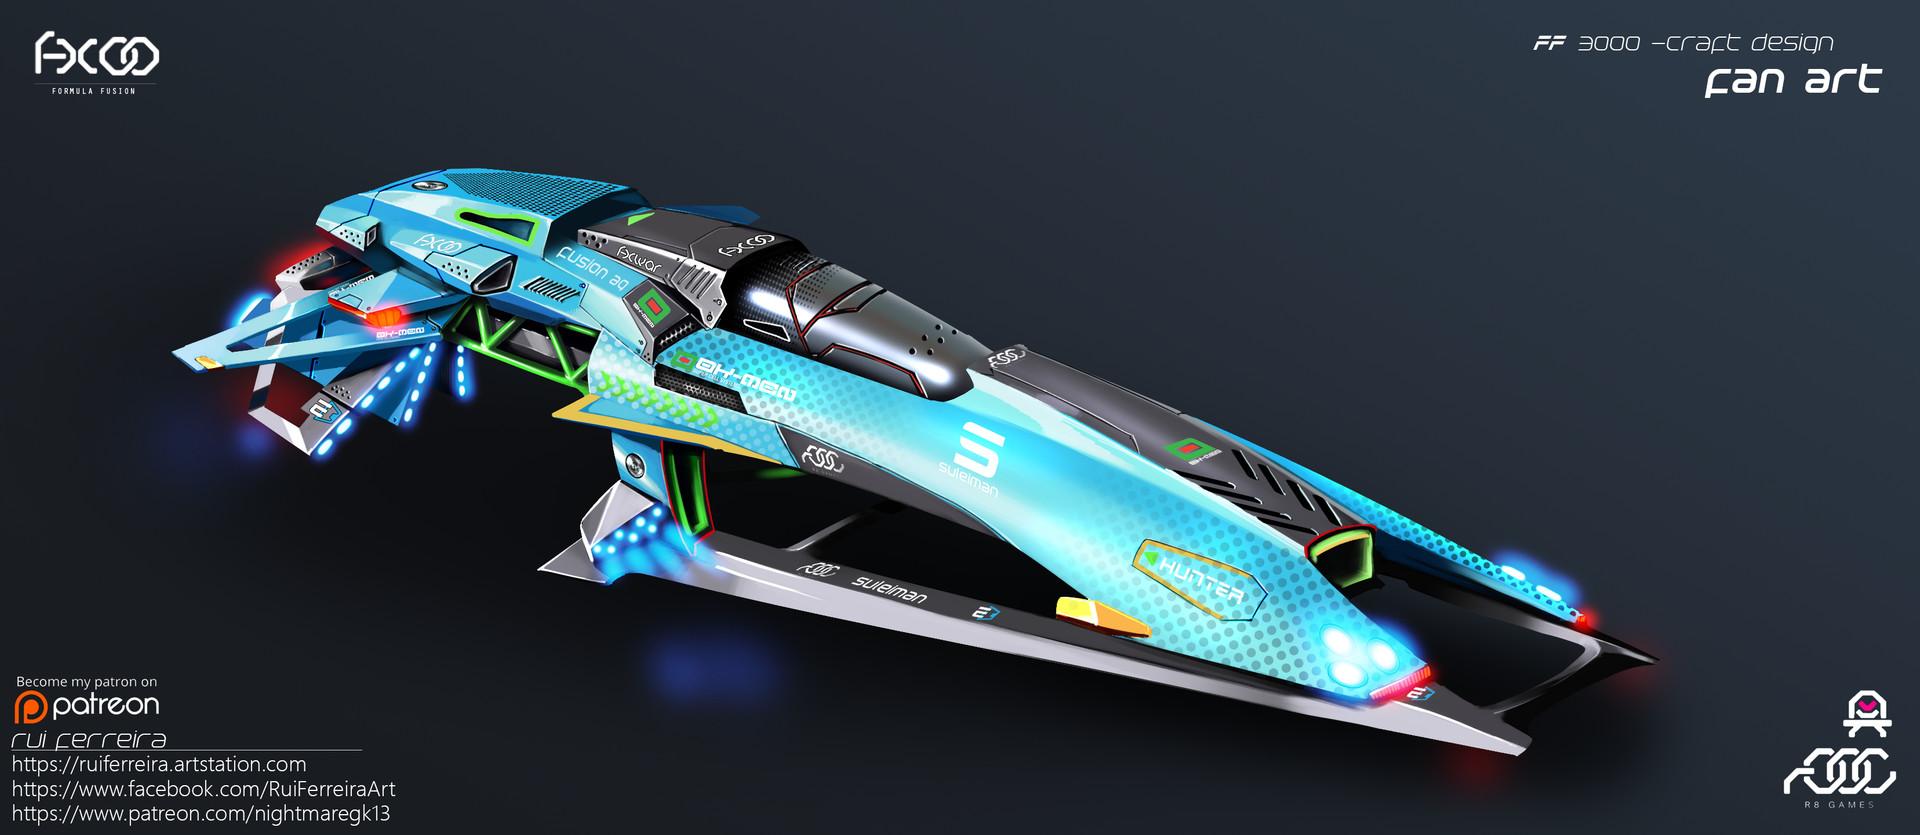 Rui ferreira ship concept 2